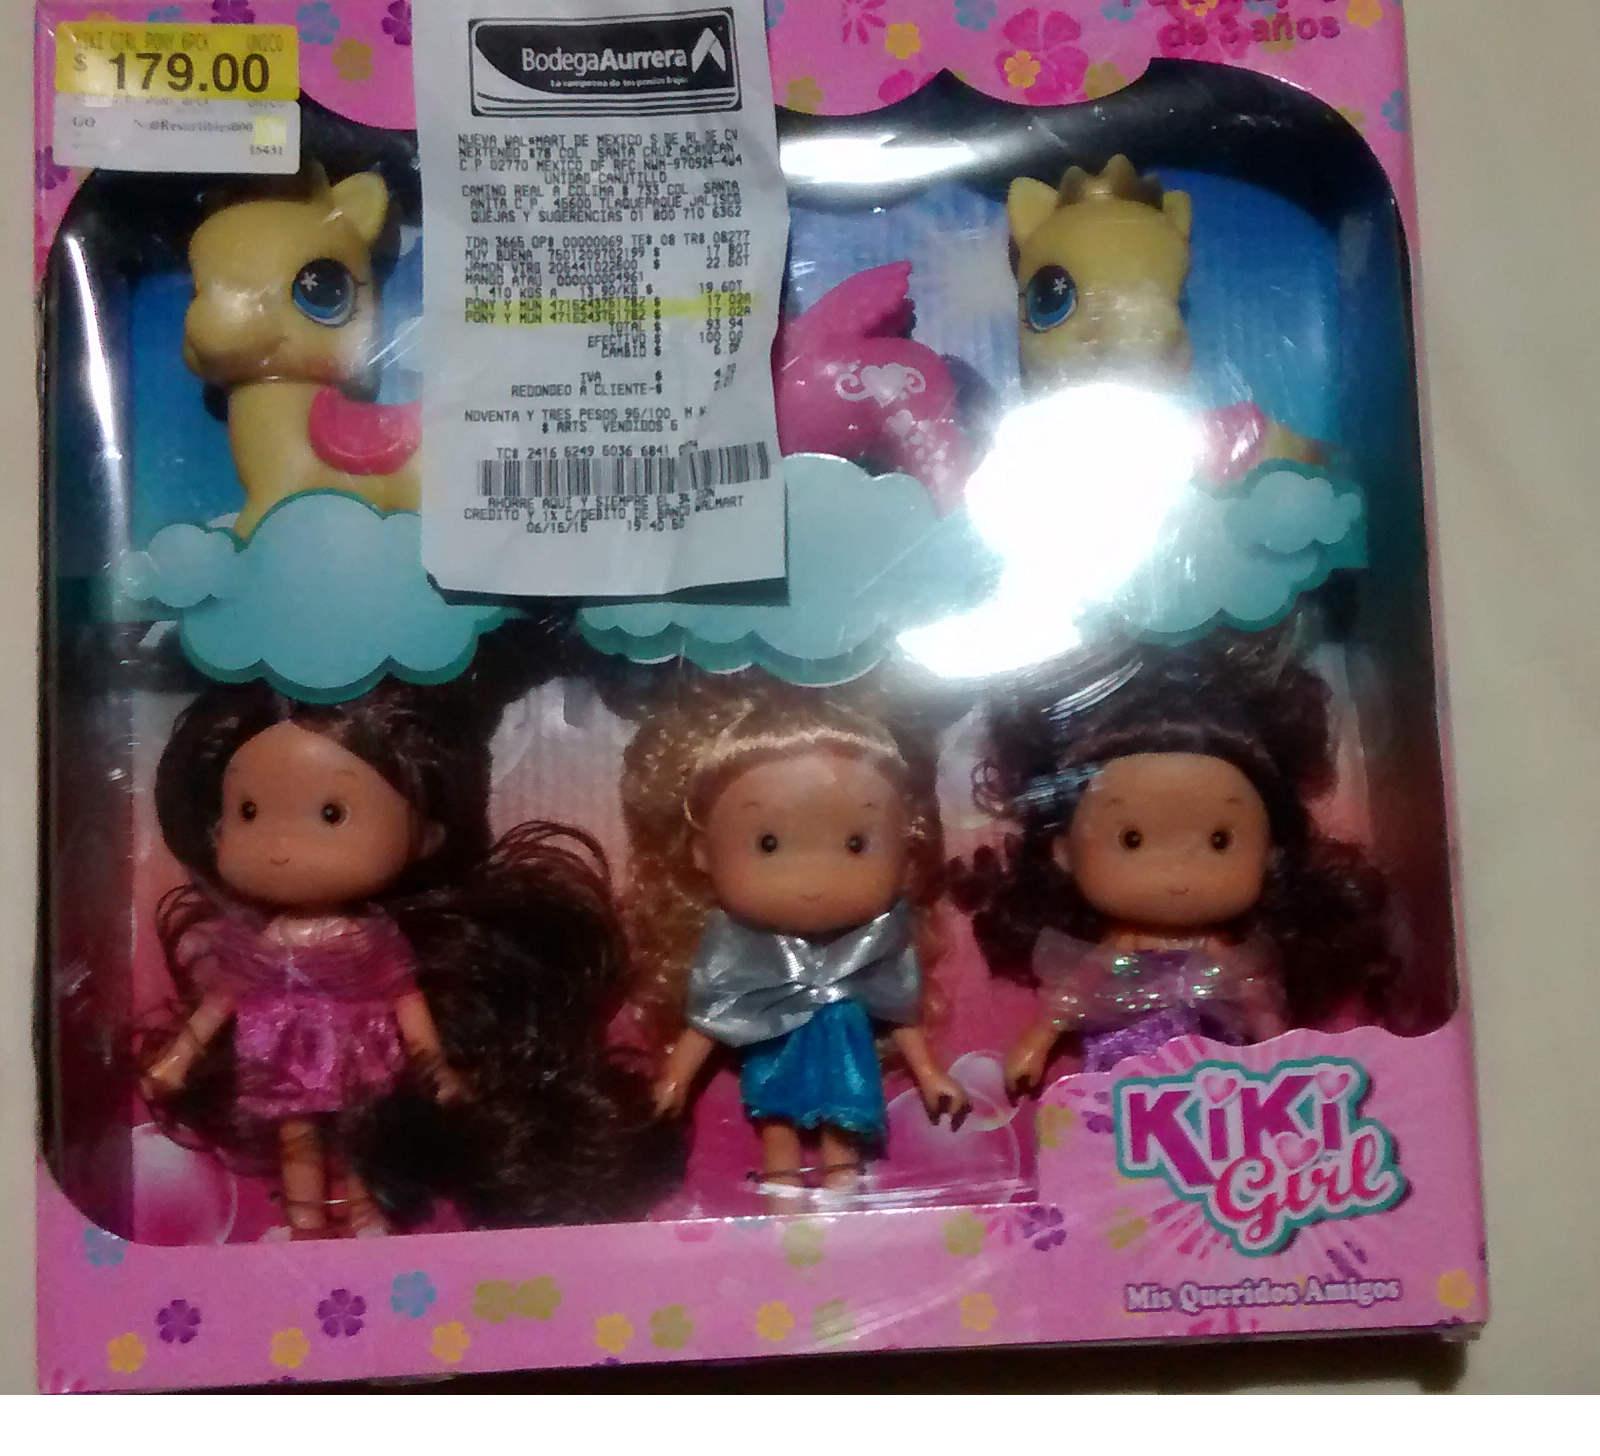 Bodega Aurrerá: juguete Pony Kiki Girls de $179  a  $17.02